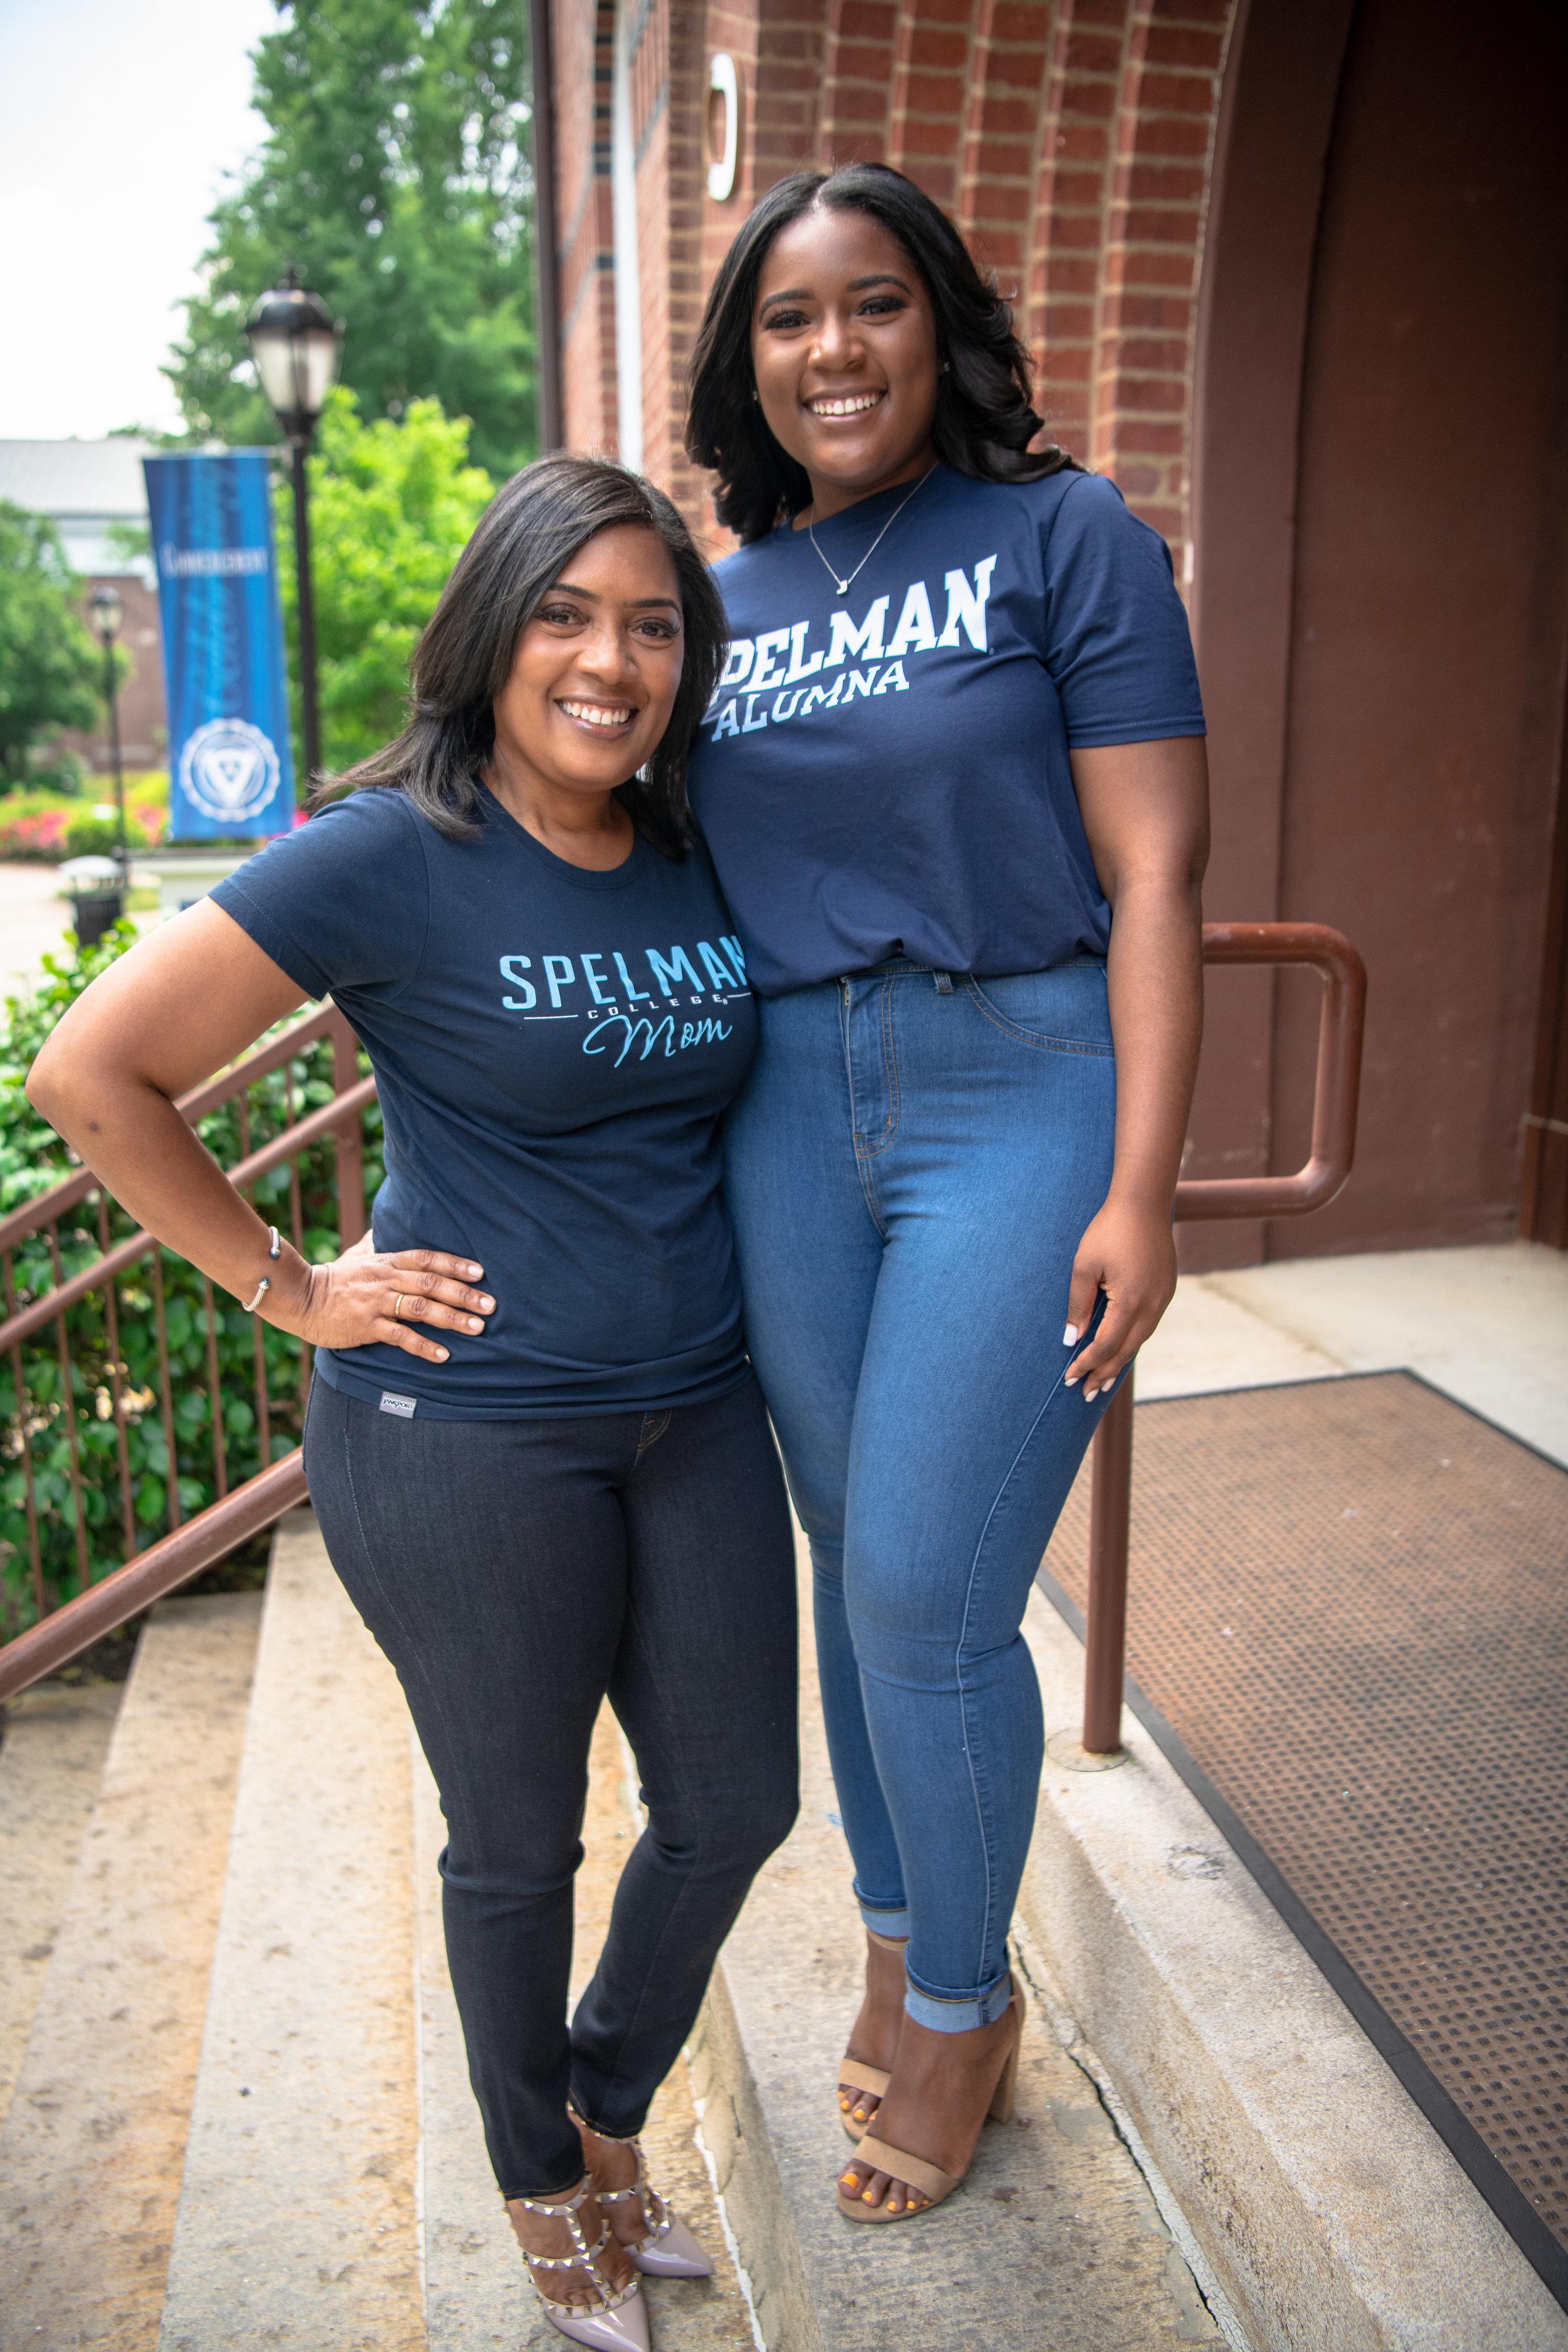 Yolanda and Sapphire